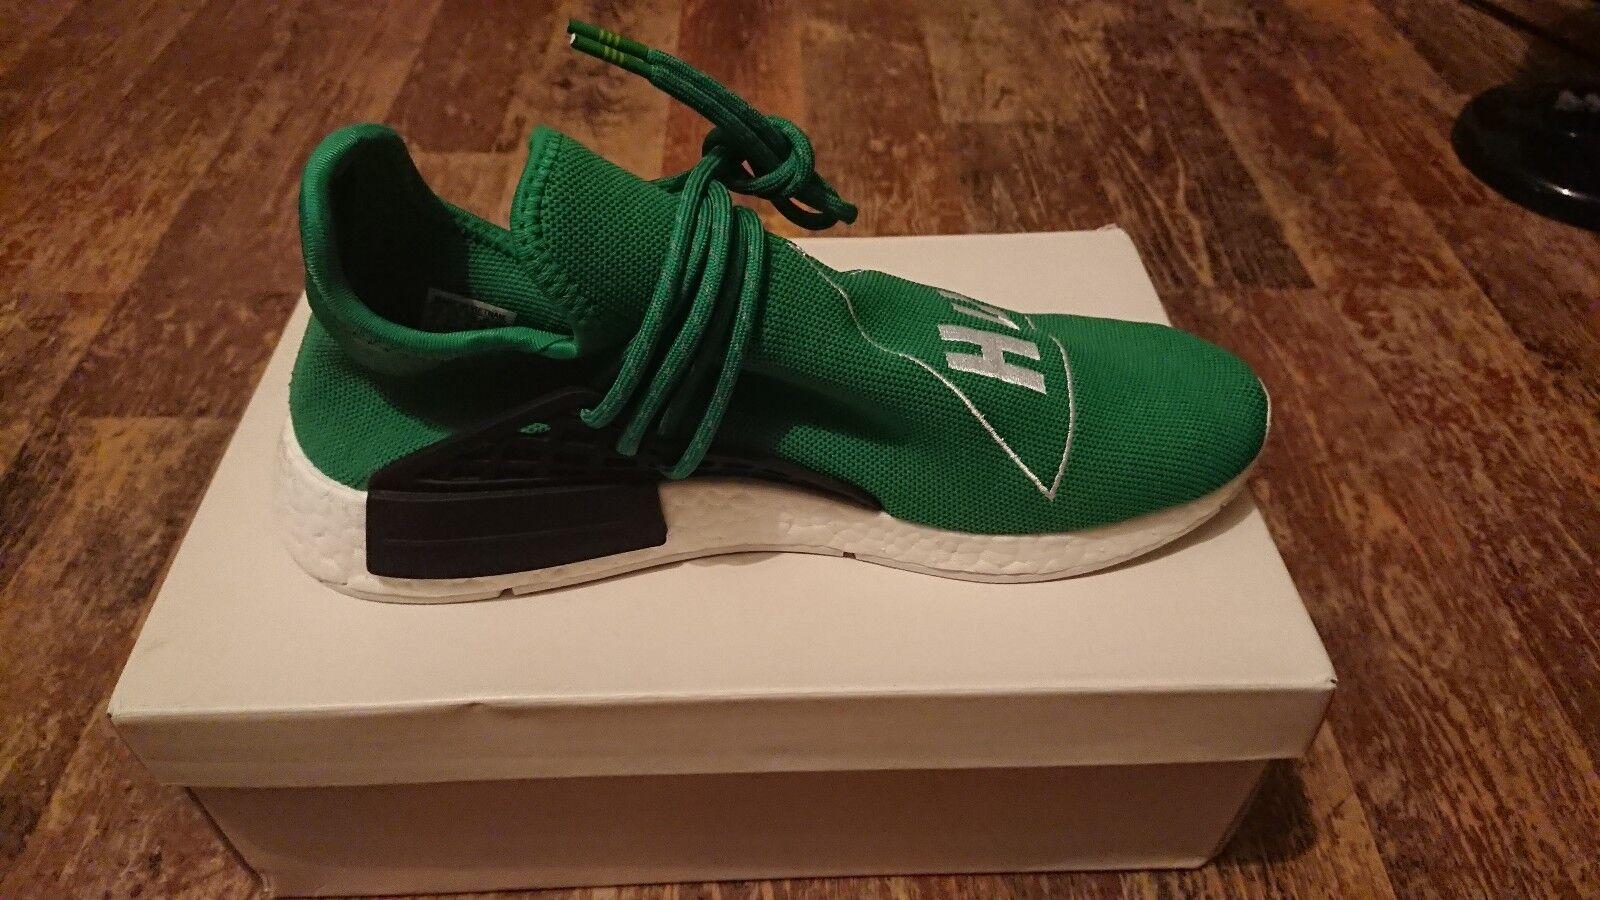 Adidas X NMD Pharrell Williams Hu NMD X Human Race Green d85578